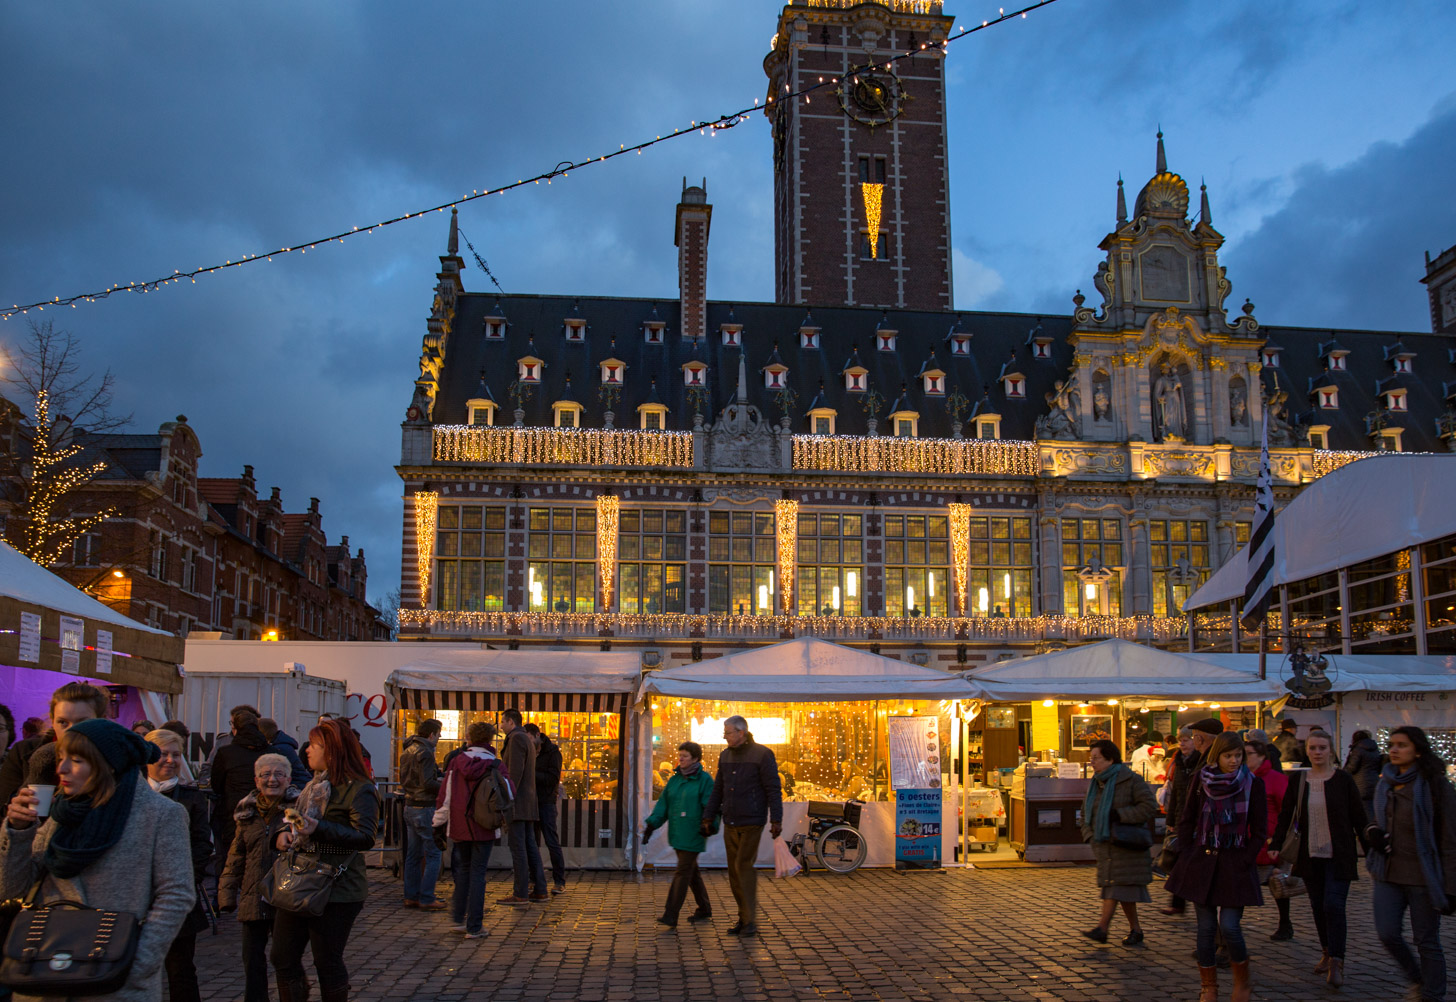 De Leuvense kerstmarkt op het moment dat de avond valt.